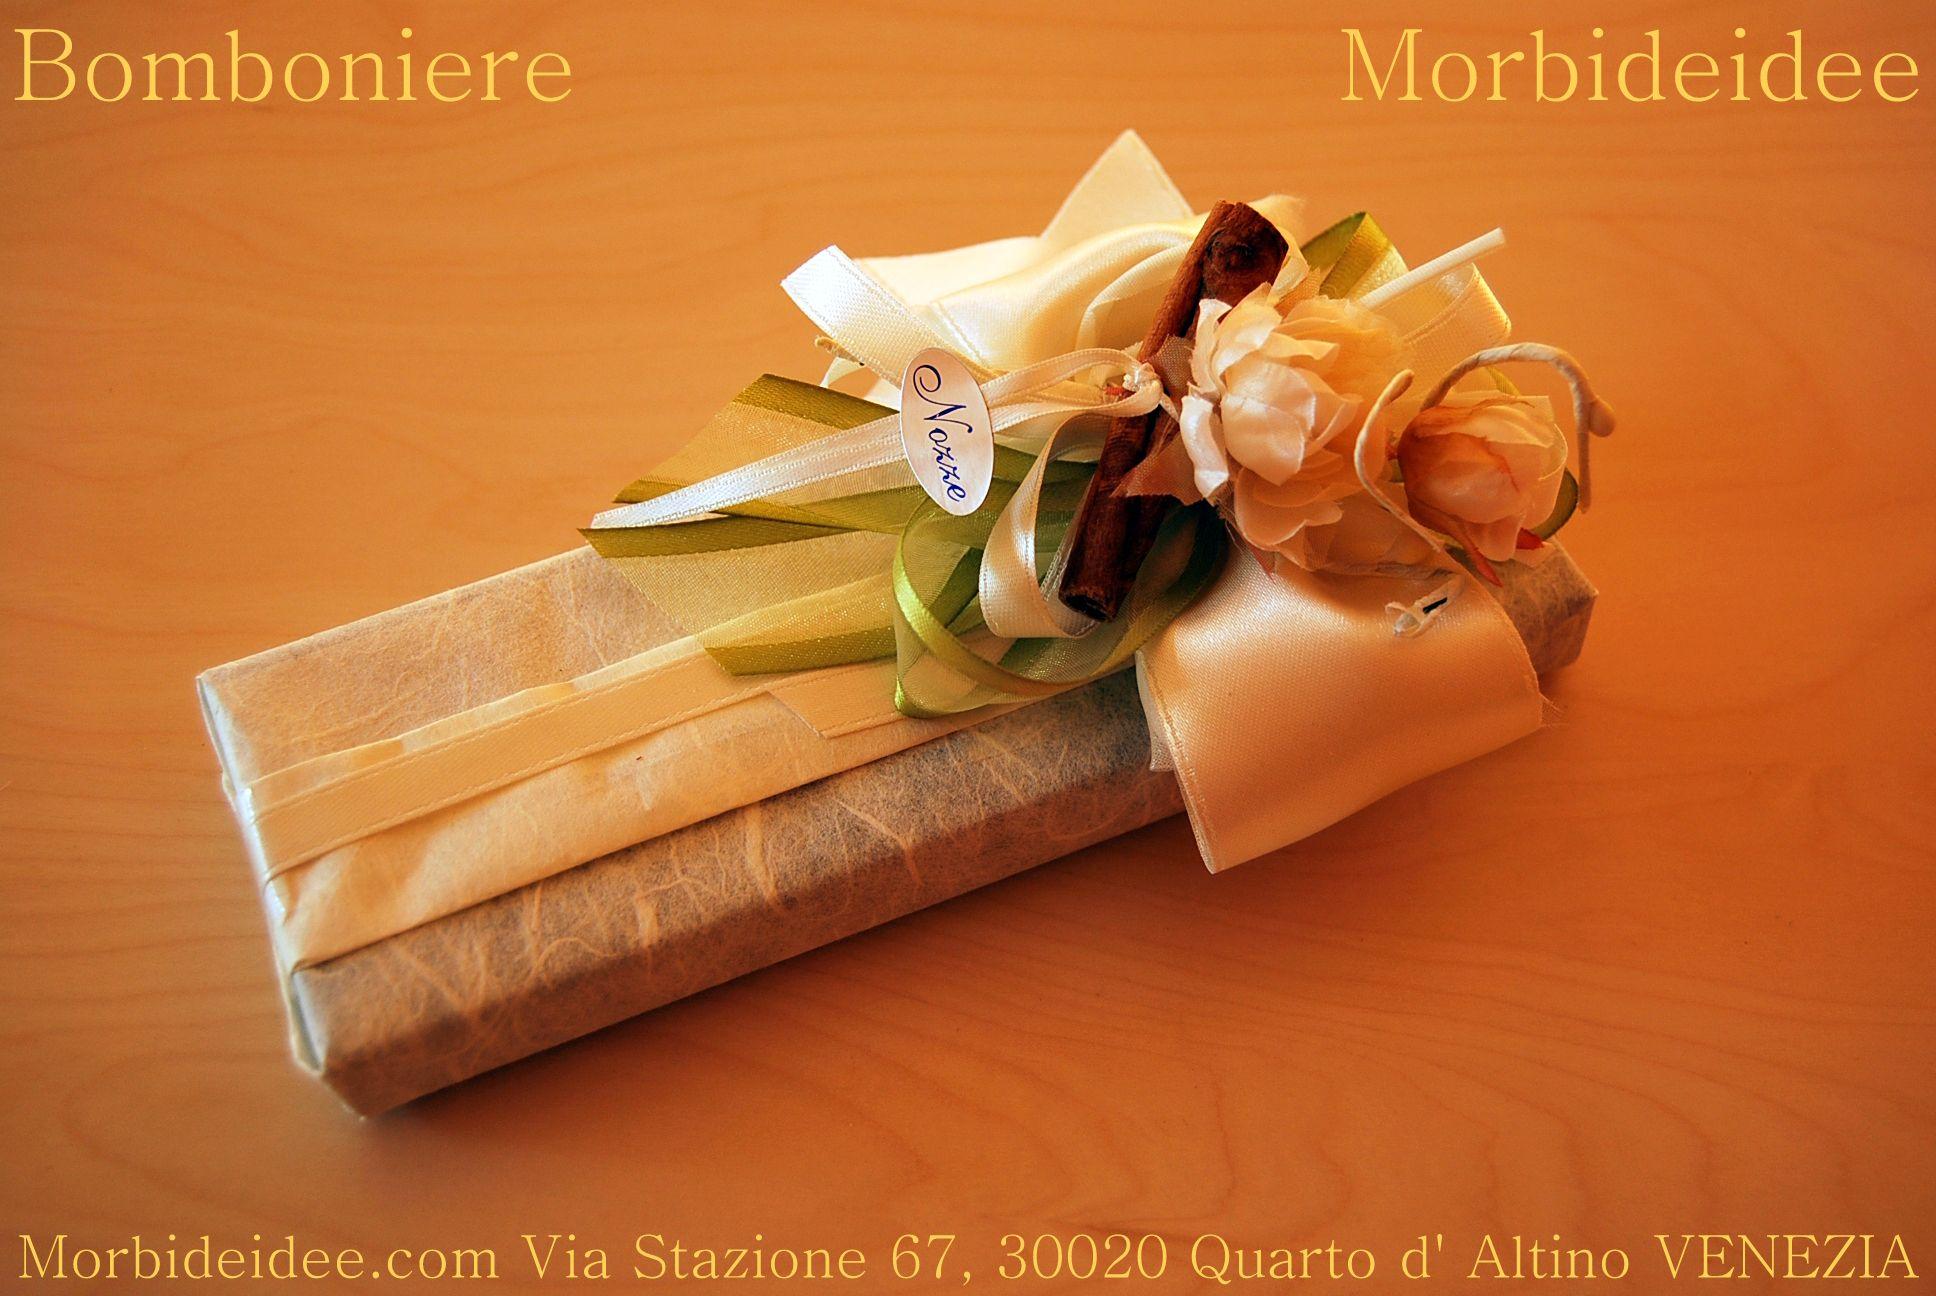 www.morbideidee.it